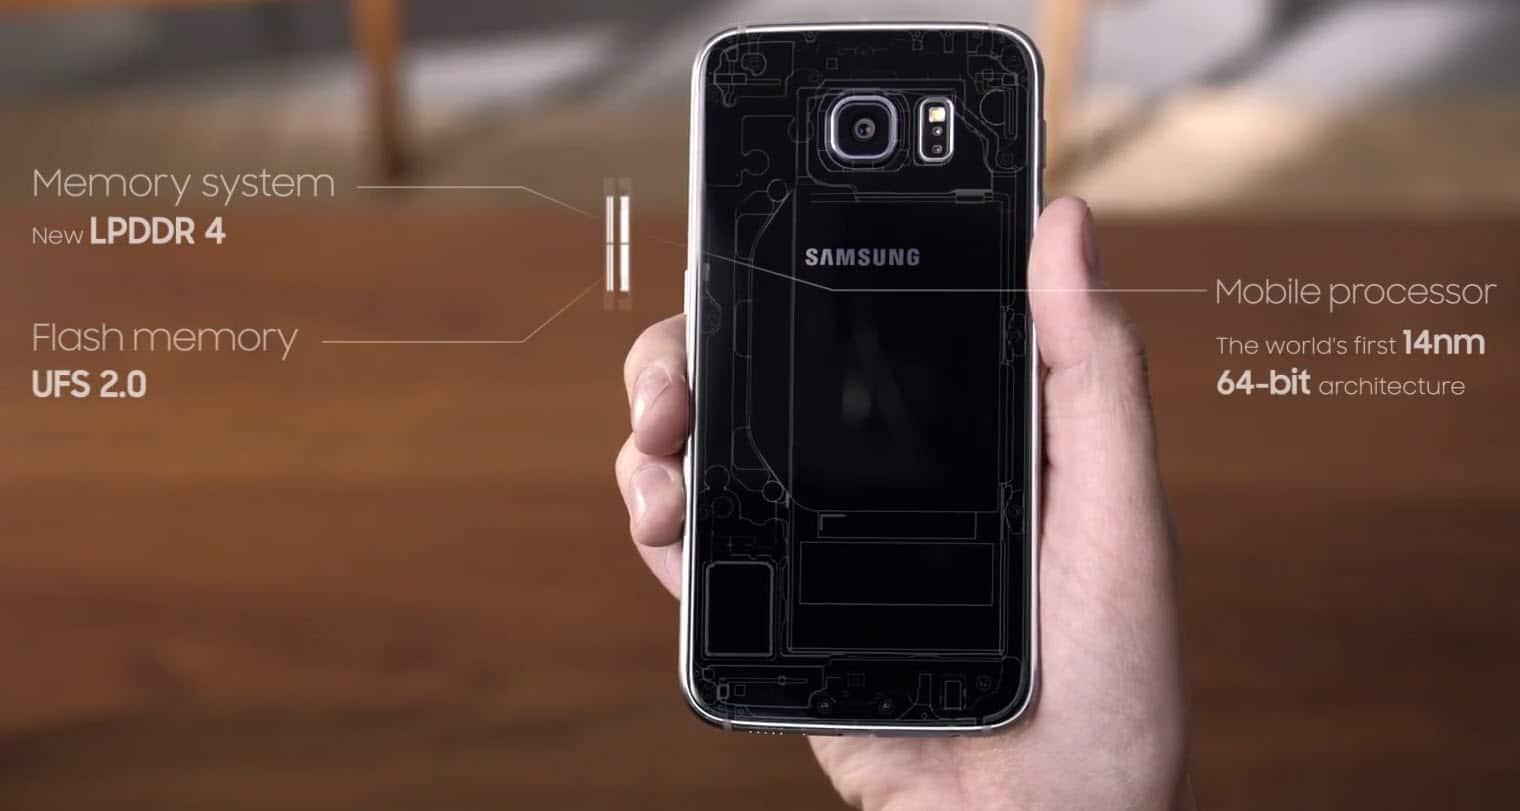 Samsung S6 Designing